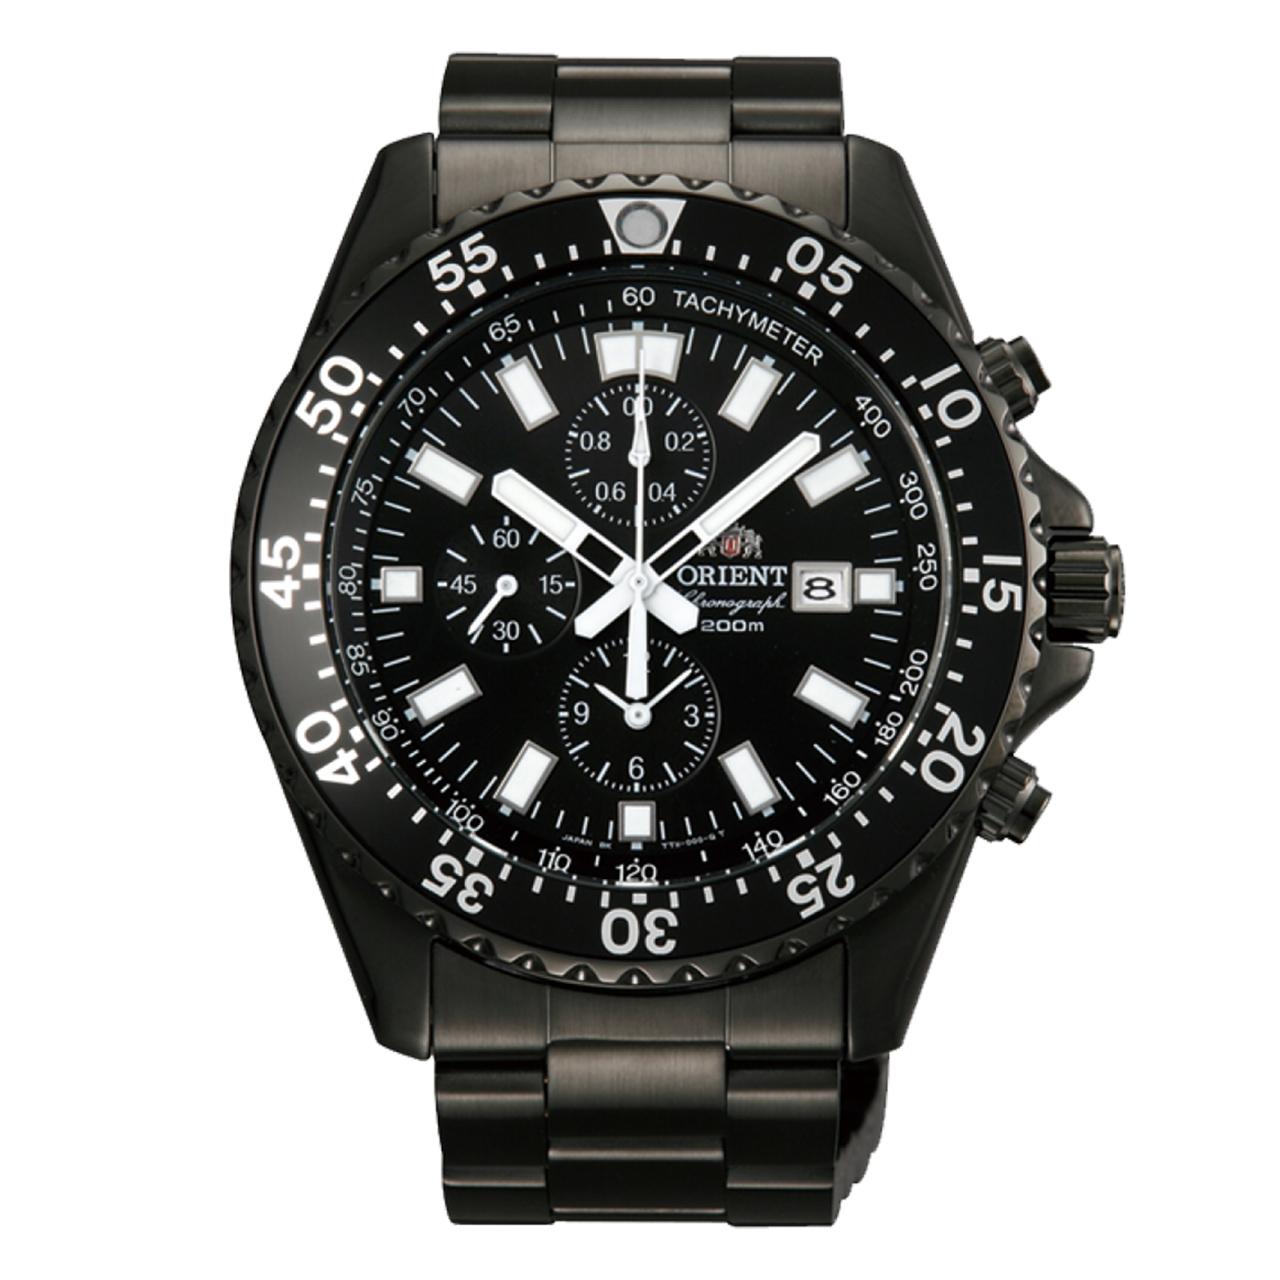 ساعت مچی عقربه ای مردانه  اورینت مدل STT11001B0